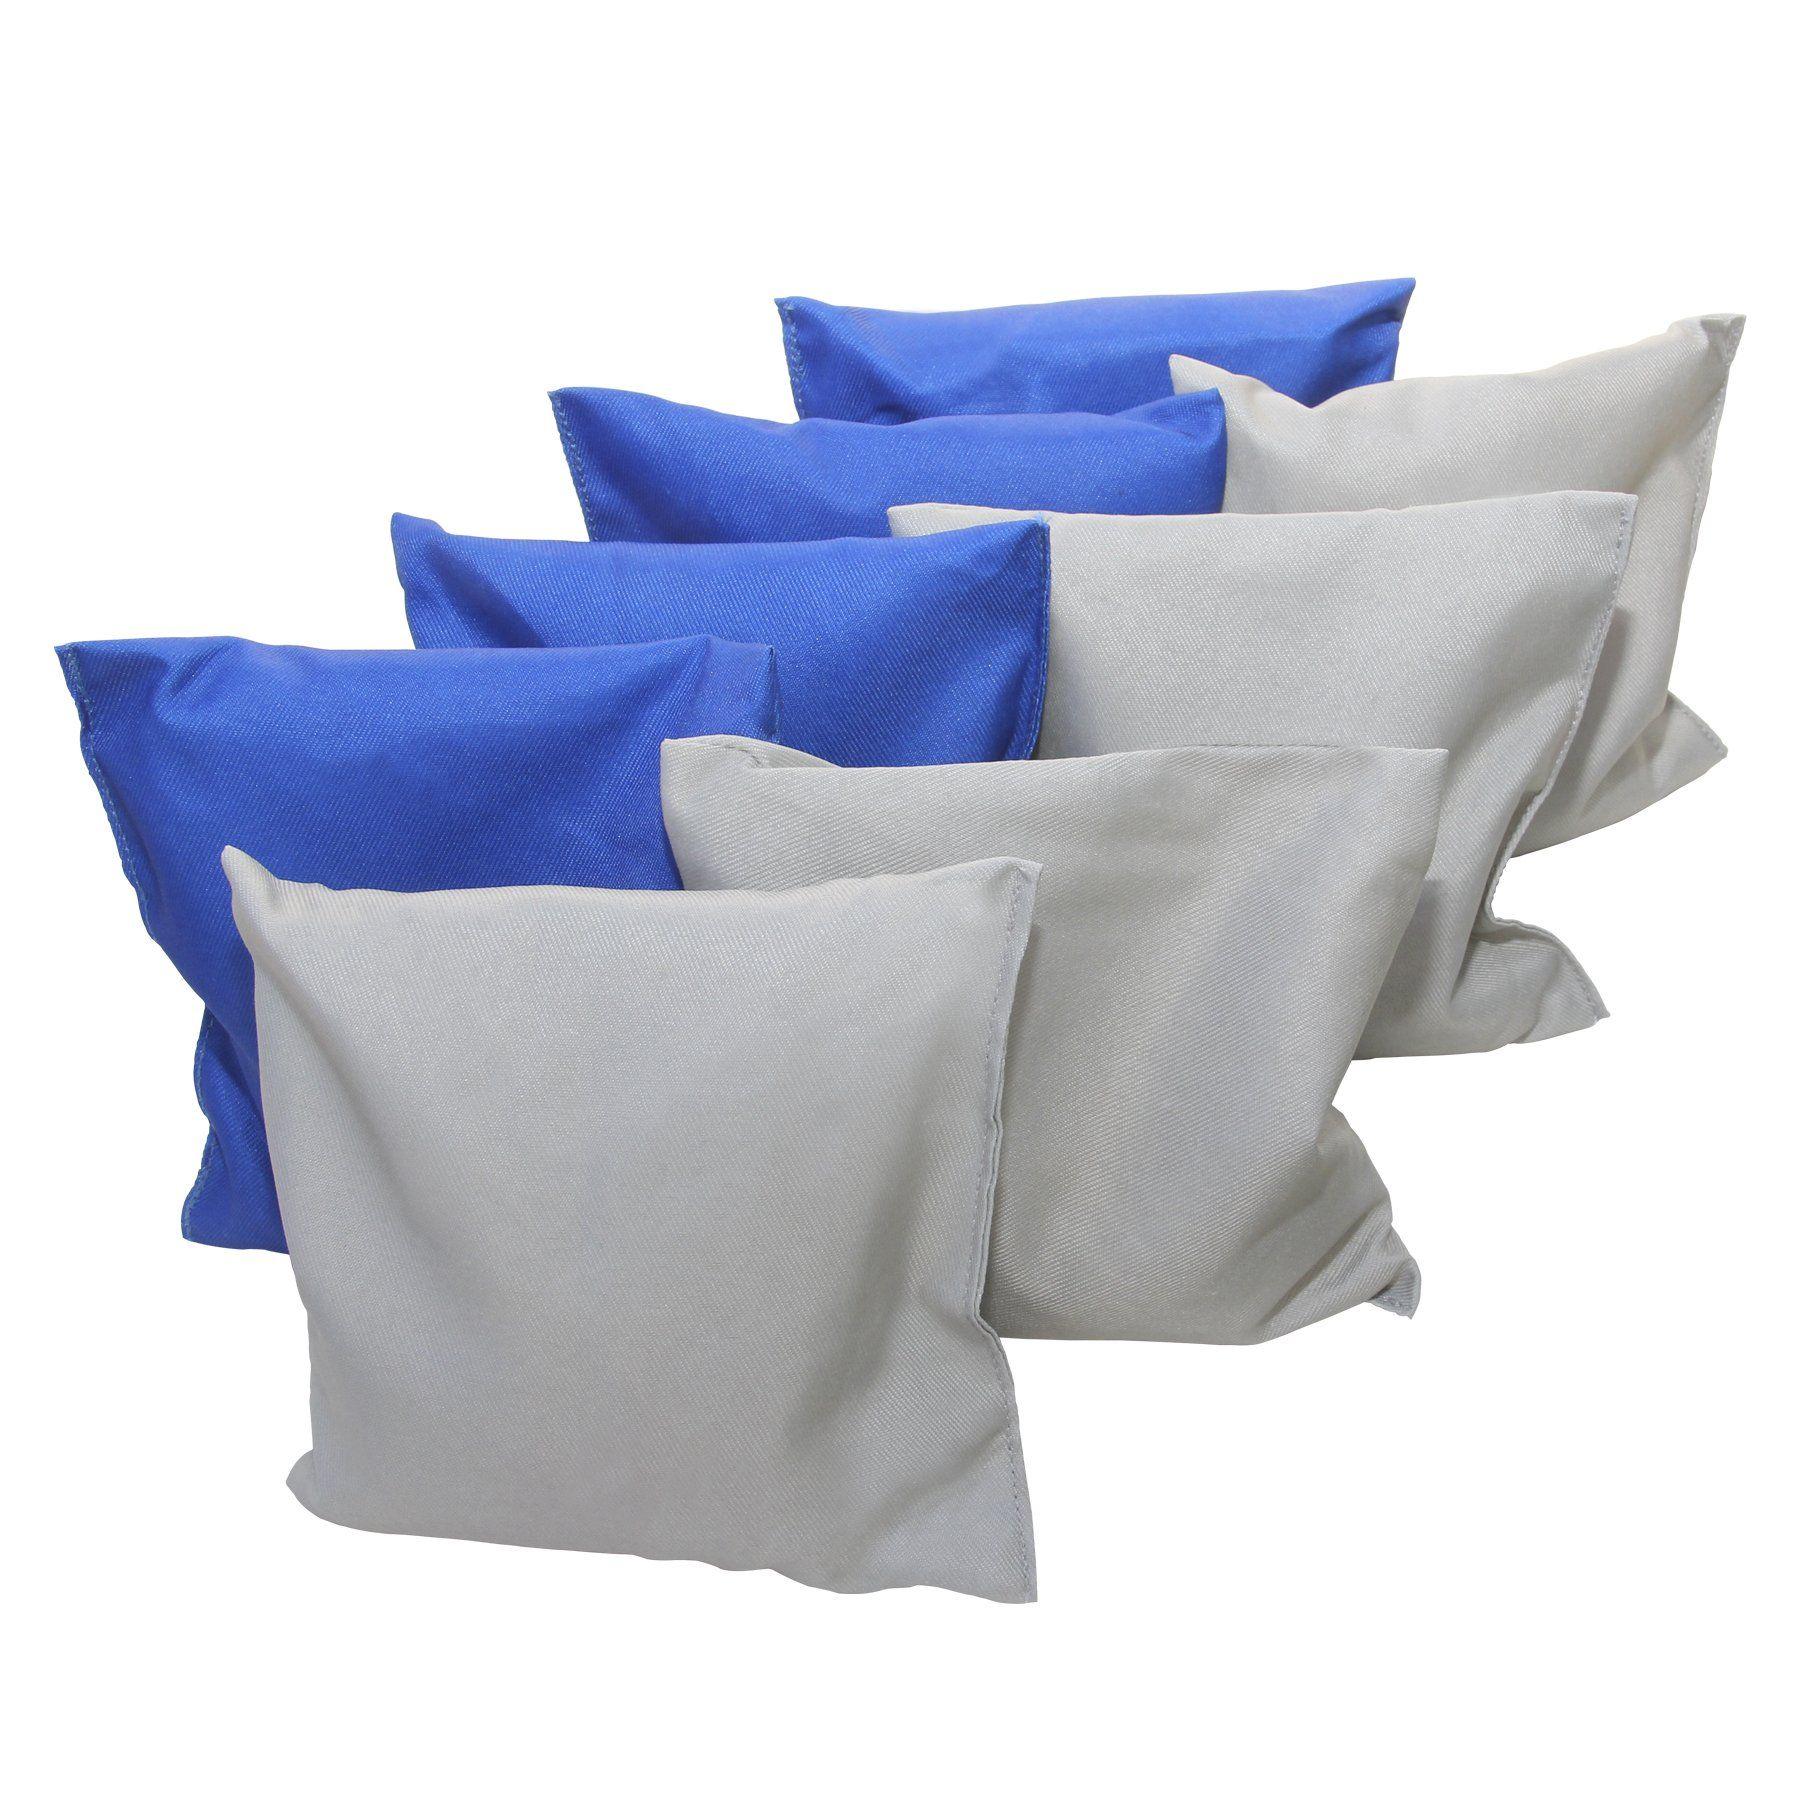 Verus Sports TGA255 Cornhole or Toss Replacement Bean Bag